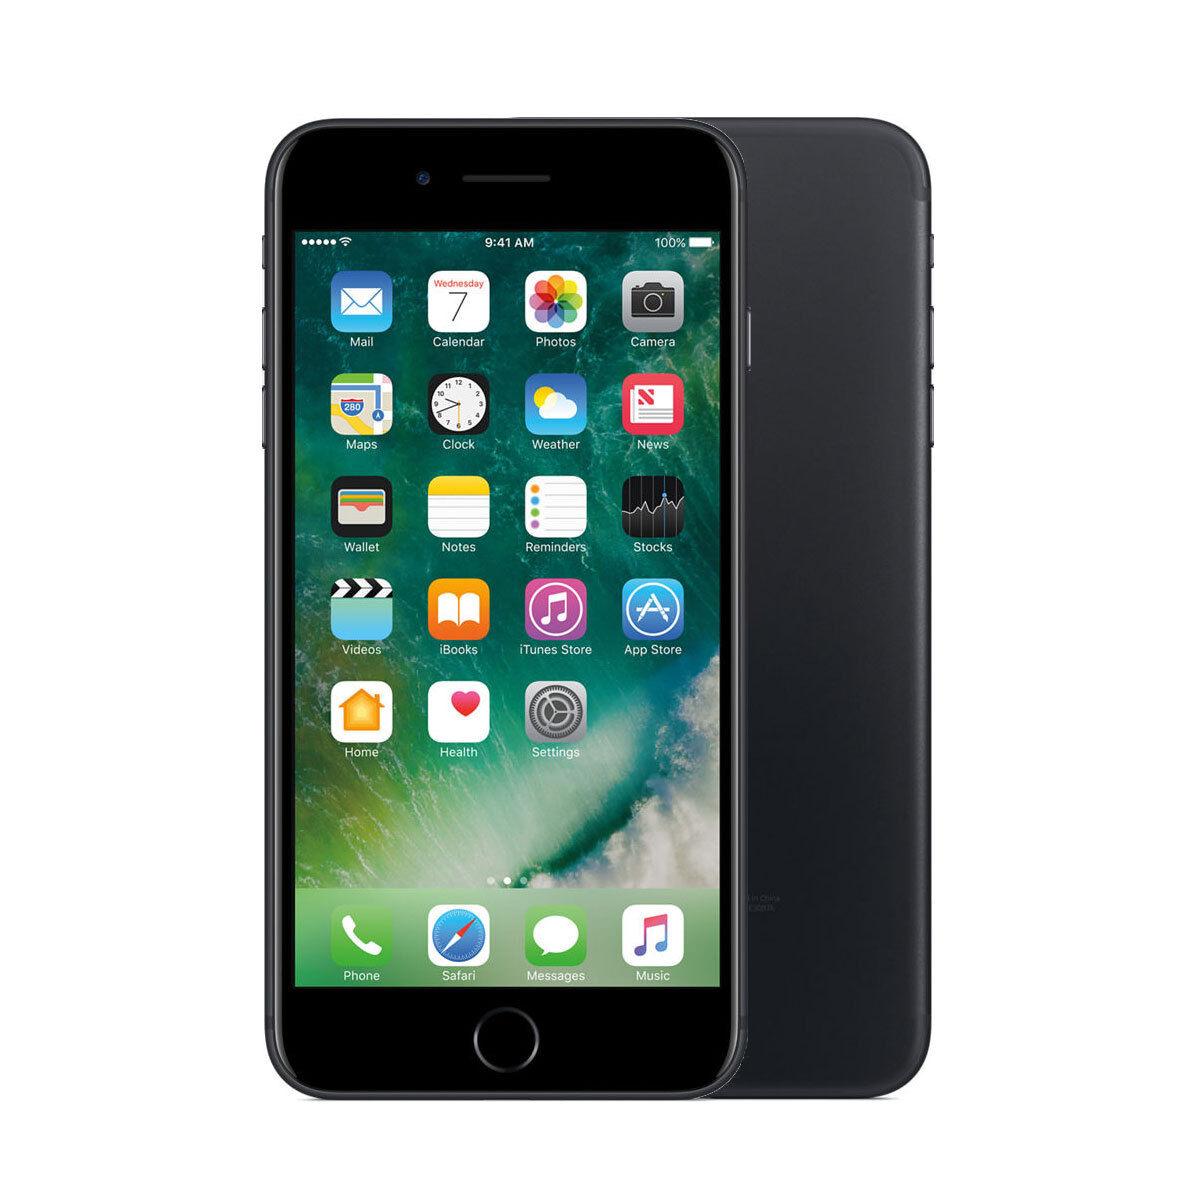 Apple iPhone 7 Plus 128GB Factory Unlocked 4G LTE iOS WiFi Smartphone